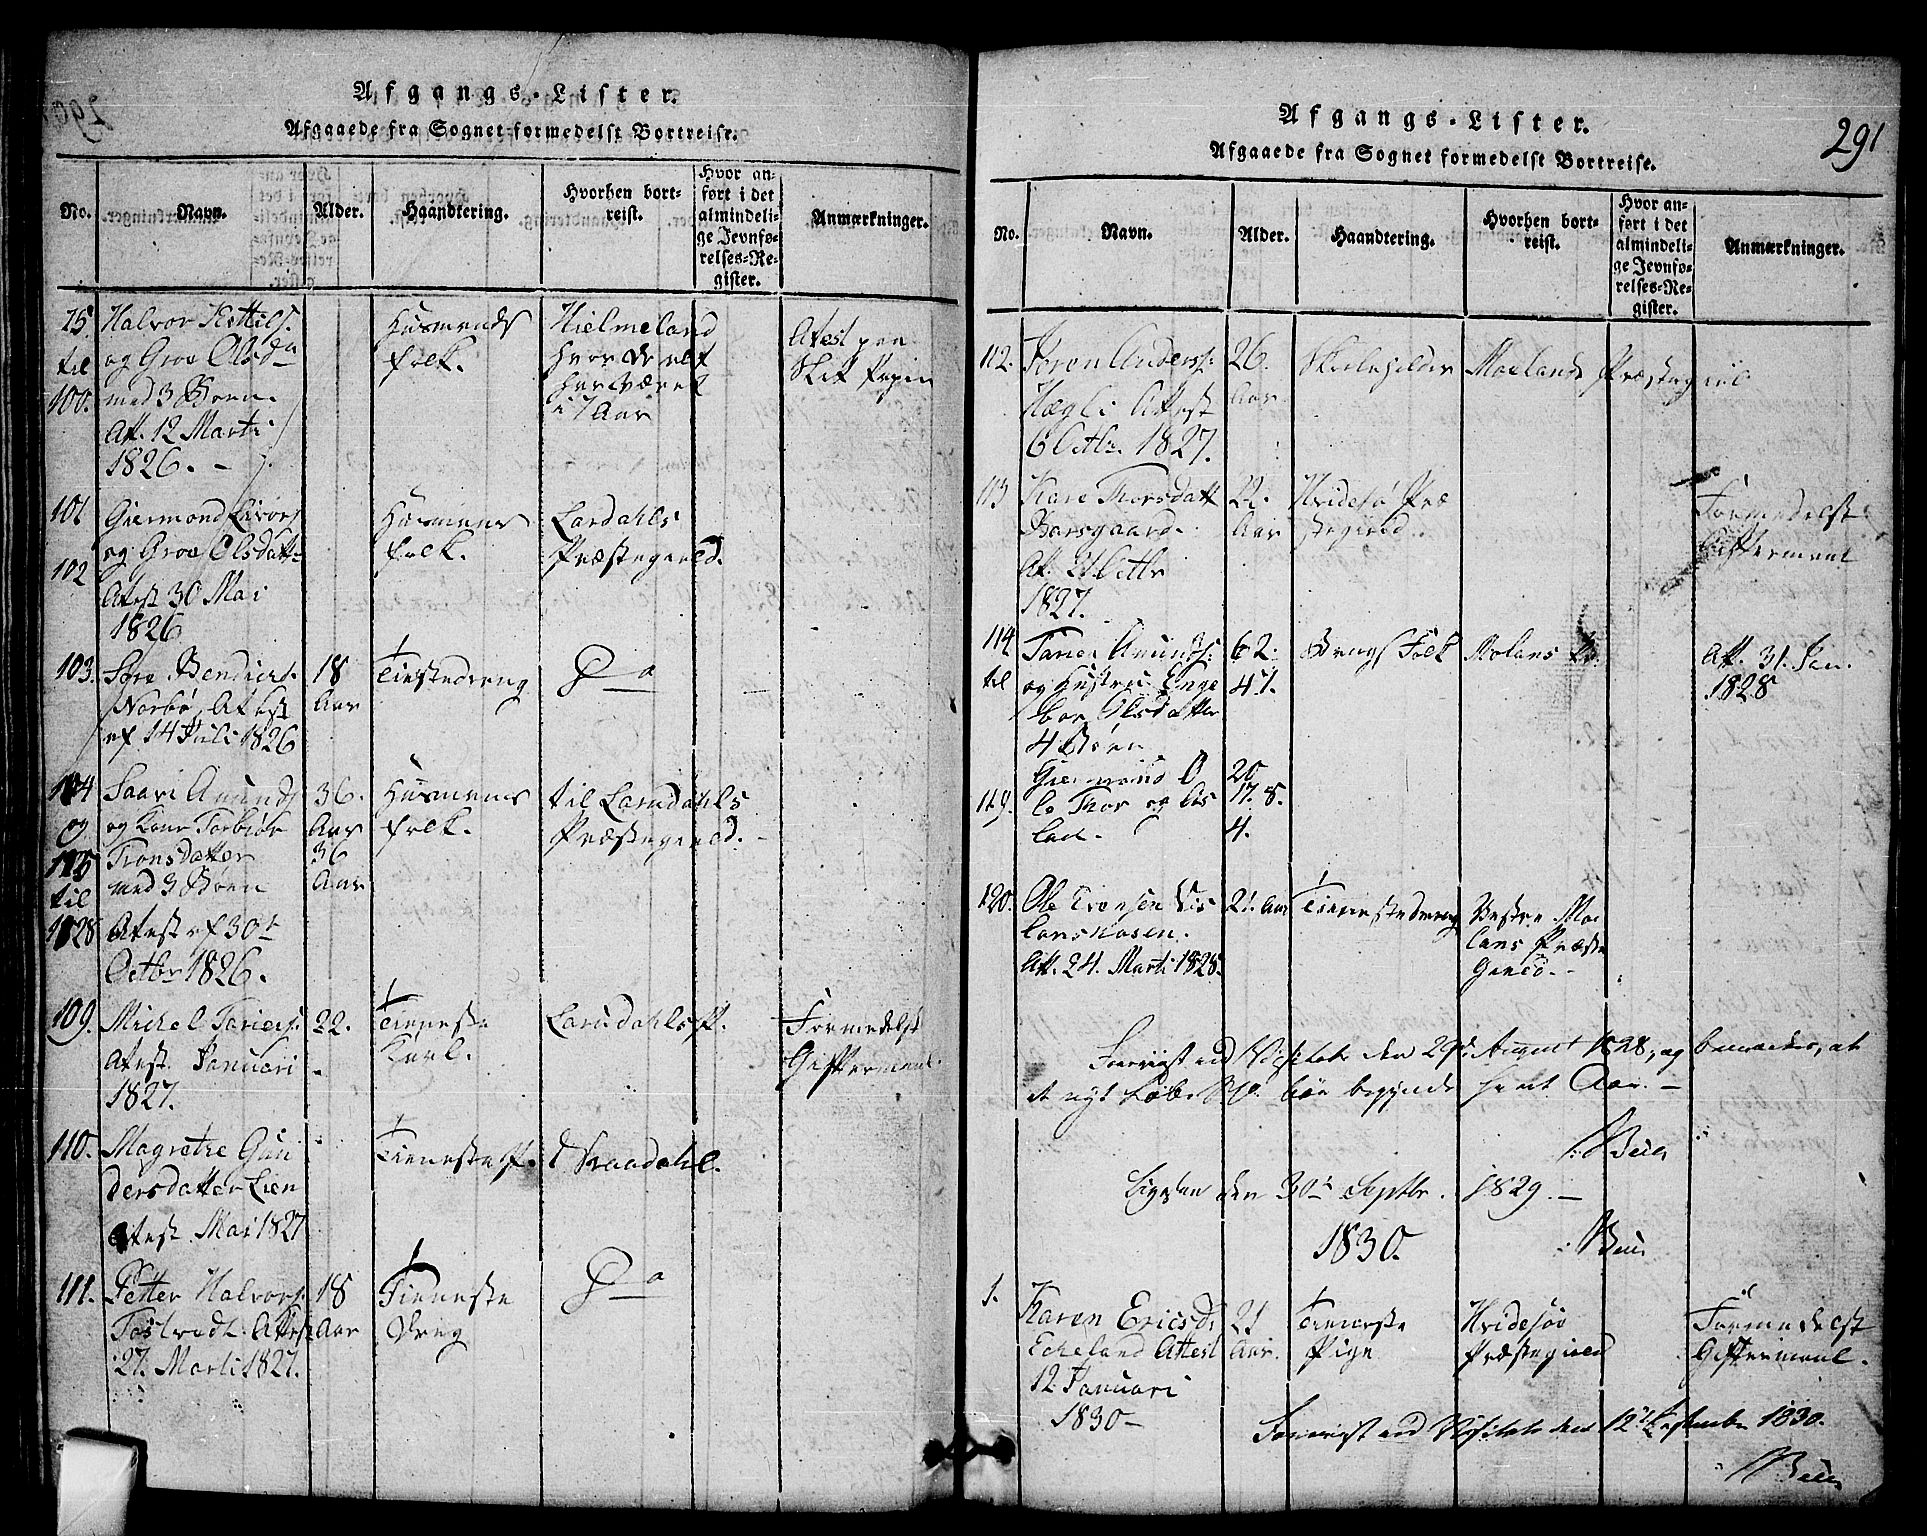 SAKO, Mo kirkebøker, G/Gb/L0001: Klokkerbok nr. II 1, 1814-1843, s. 291